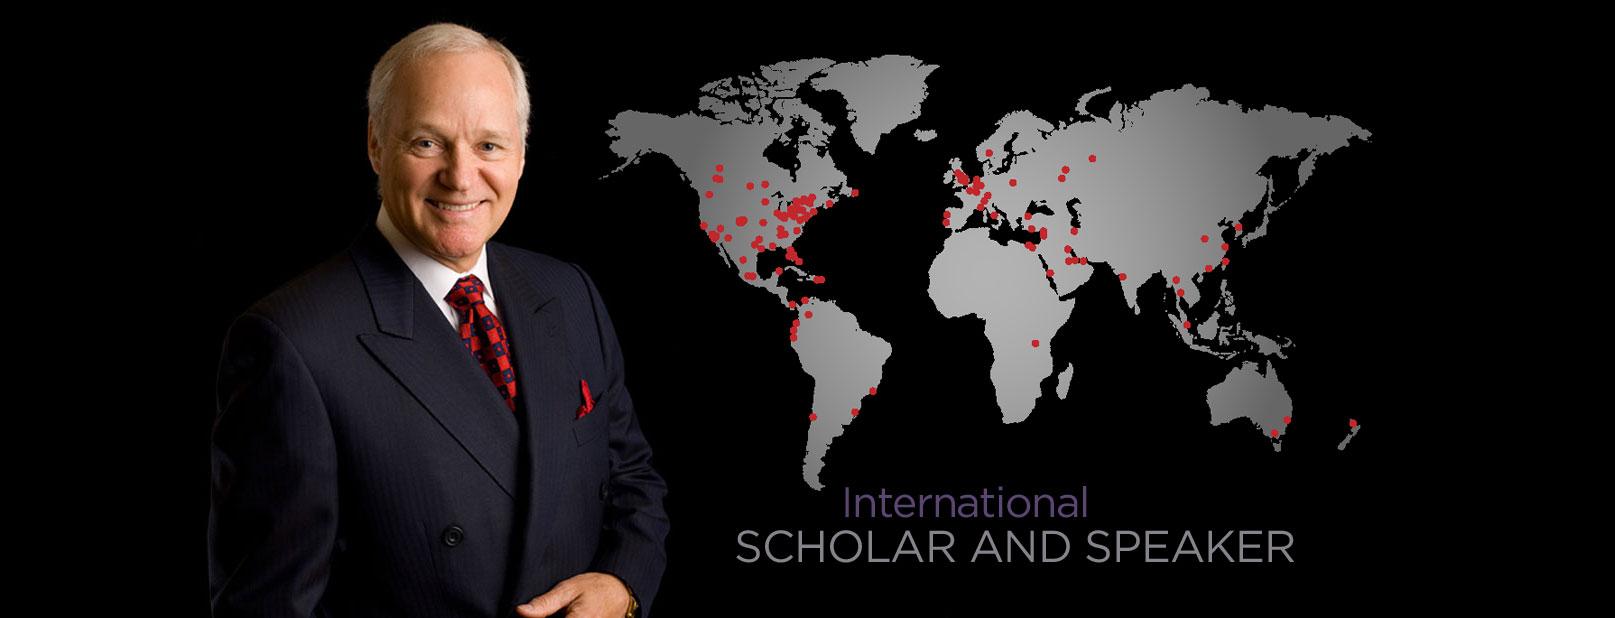 Dr. Adamson is an international scholar and speaker (horizontal banner)